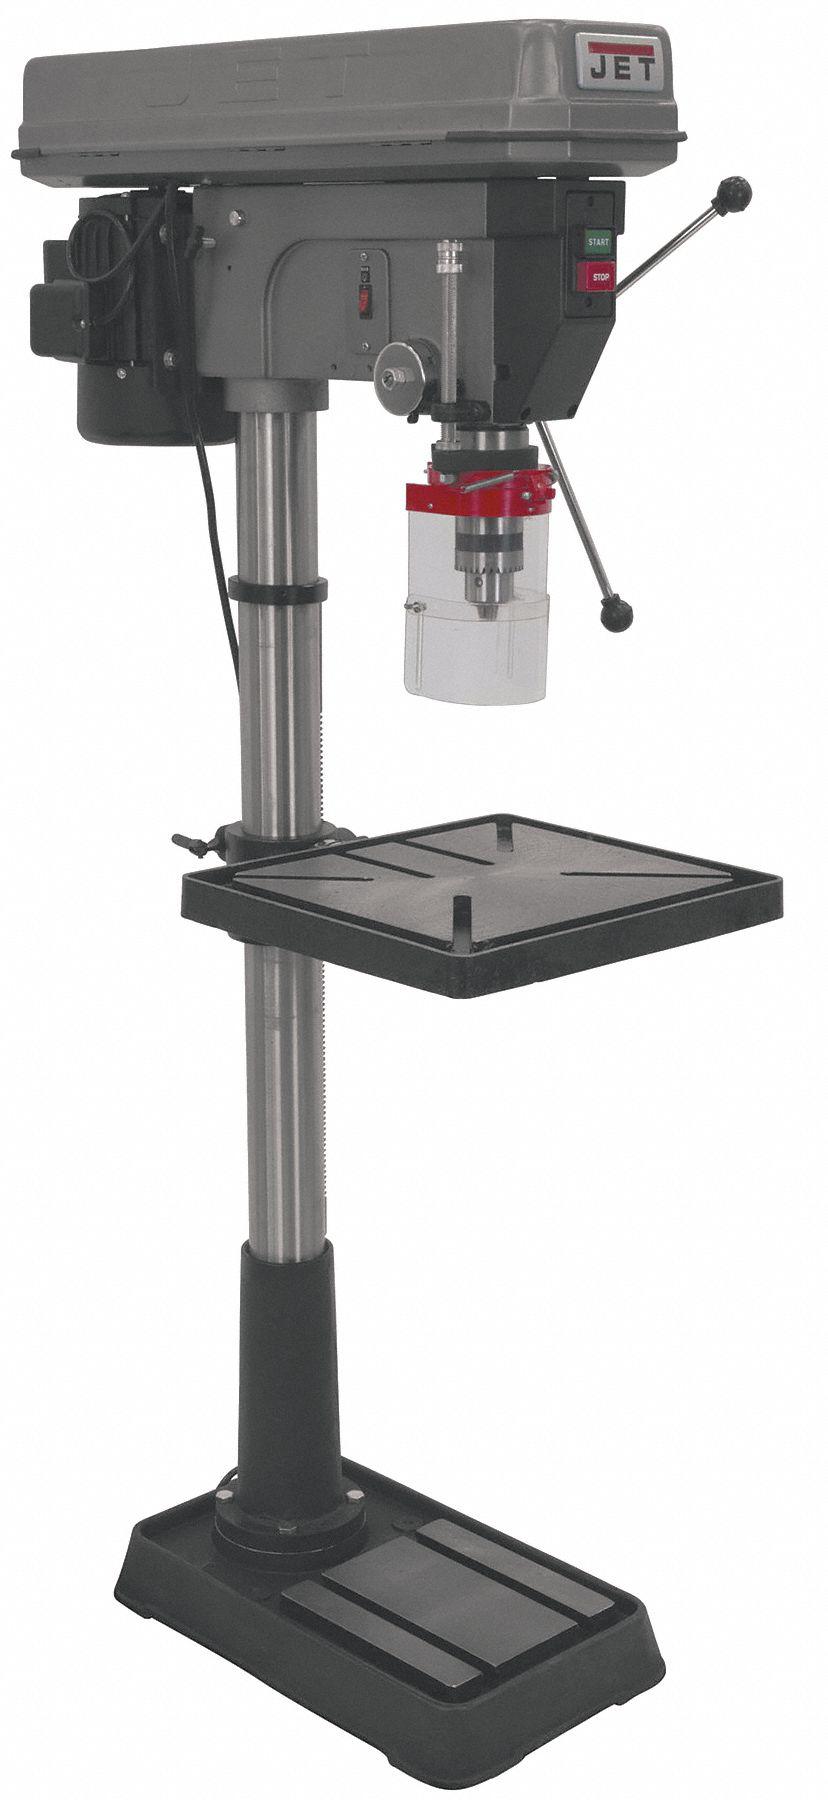 hight resolution of jet 1 1 2 motor hp floor drill press belt drive type 20 swing 115 230 voltage 18f196 354170 grainger